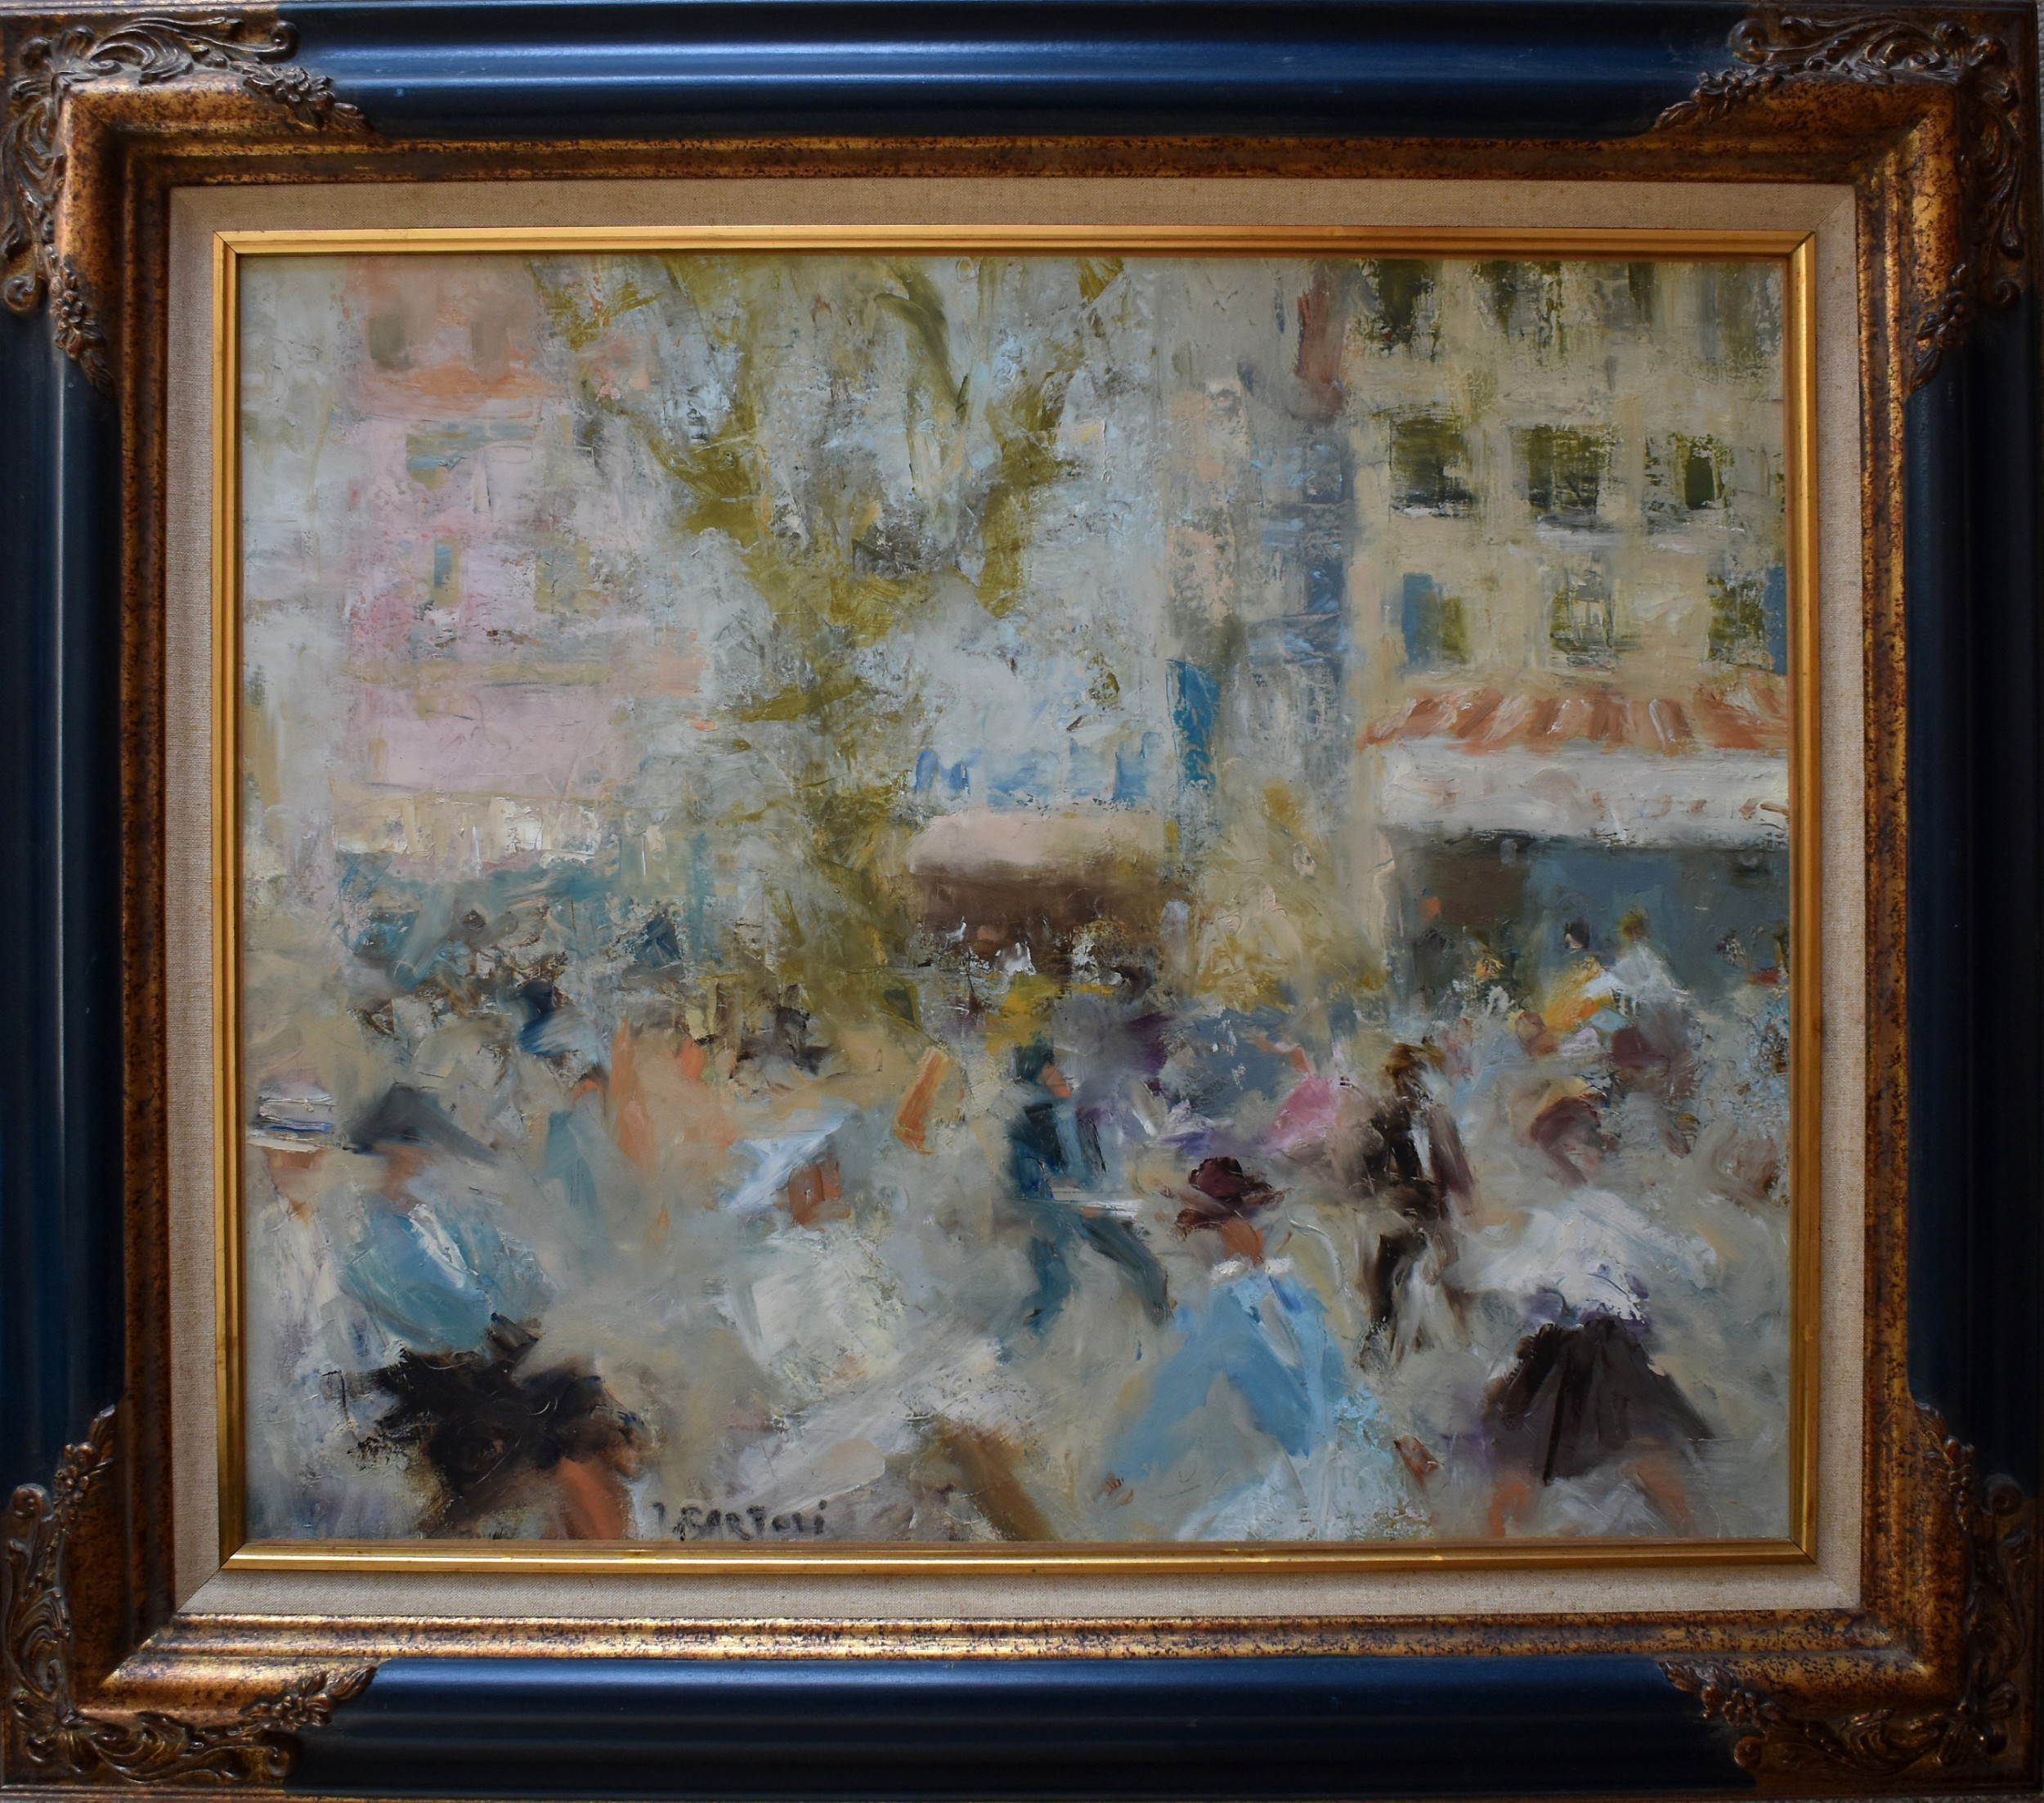 jacques bartoli 19201995 place puget toulon french impressionist